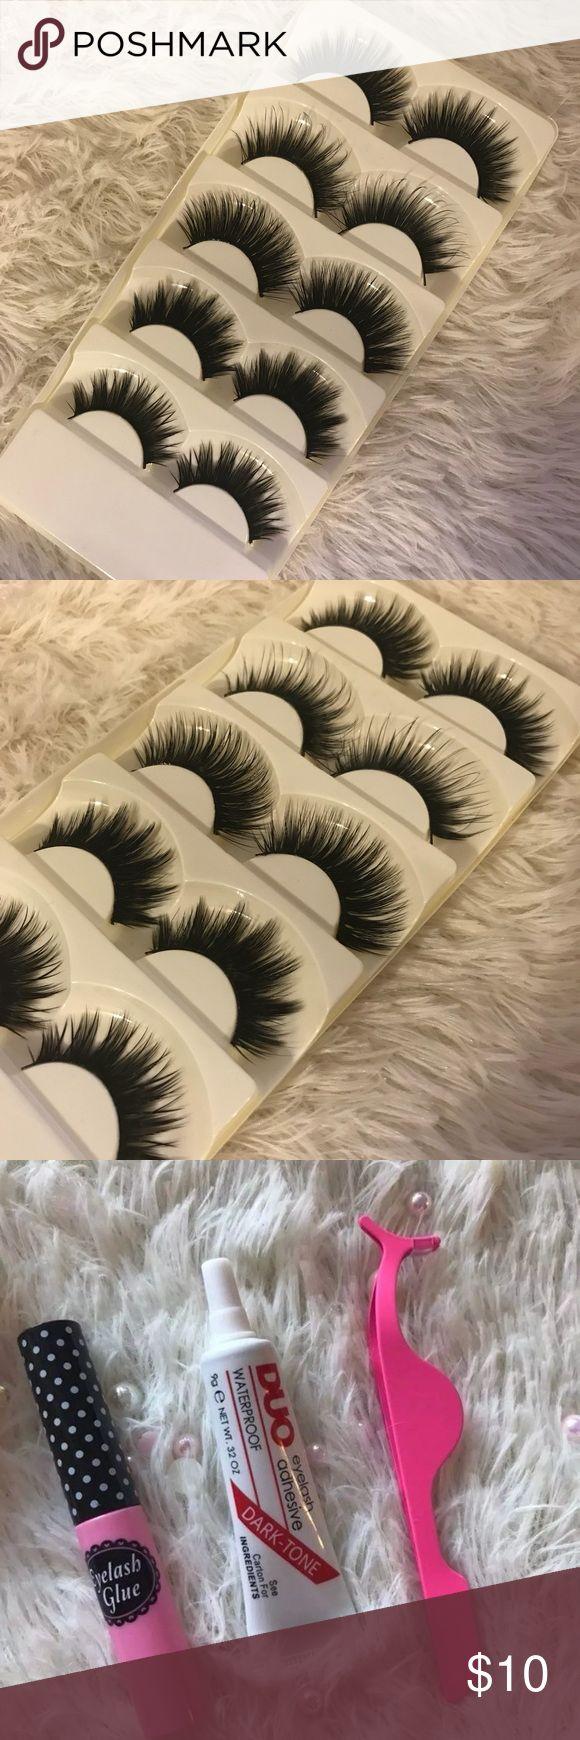 5 Eyelashes +$2 Add on eyelash Applicator +$3 Add on eyelash glue Please message me if you want to add them. # tags Iconic, mink, red cherry eyelashes, house of lashes, doll, kawaii, case, full, natural, Koko, Ardell, wispies, Demi , makeup, Iconic, mink, red cherry eyelashes, house of lashes, doll, kawaii, case, full, natural, Koko, Ardell, wispies, Demi , makeup, mascara, eyelash applicator, Mykonos Mink , Lashes , wispy ,eyelash case, mink lashes Ship within 24 hours ❣️ Makeup False…